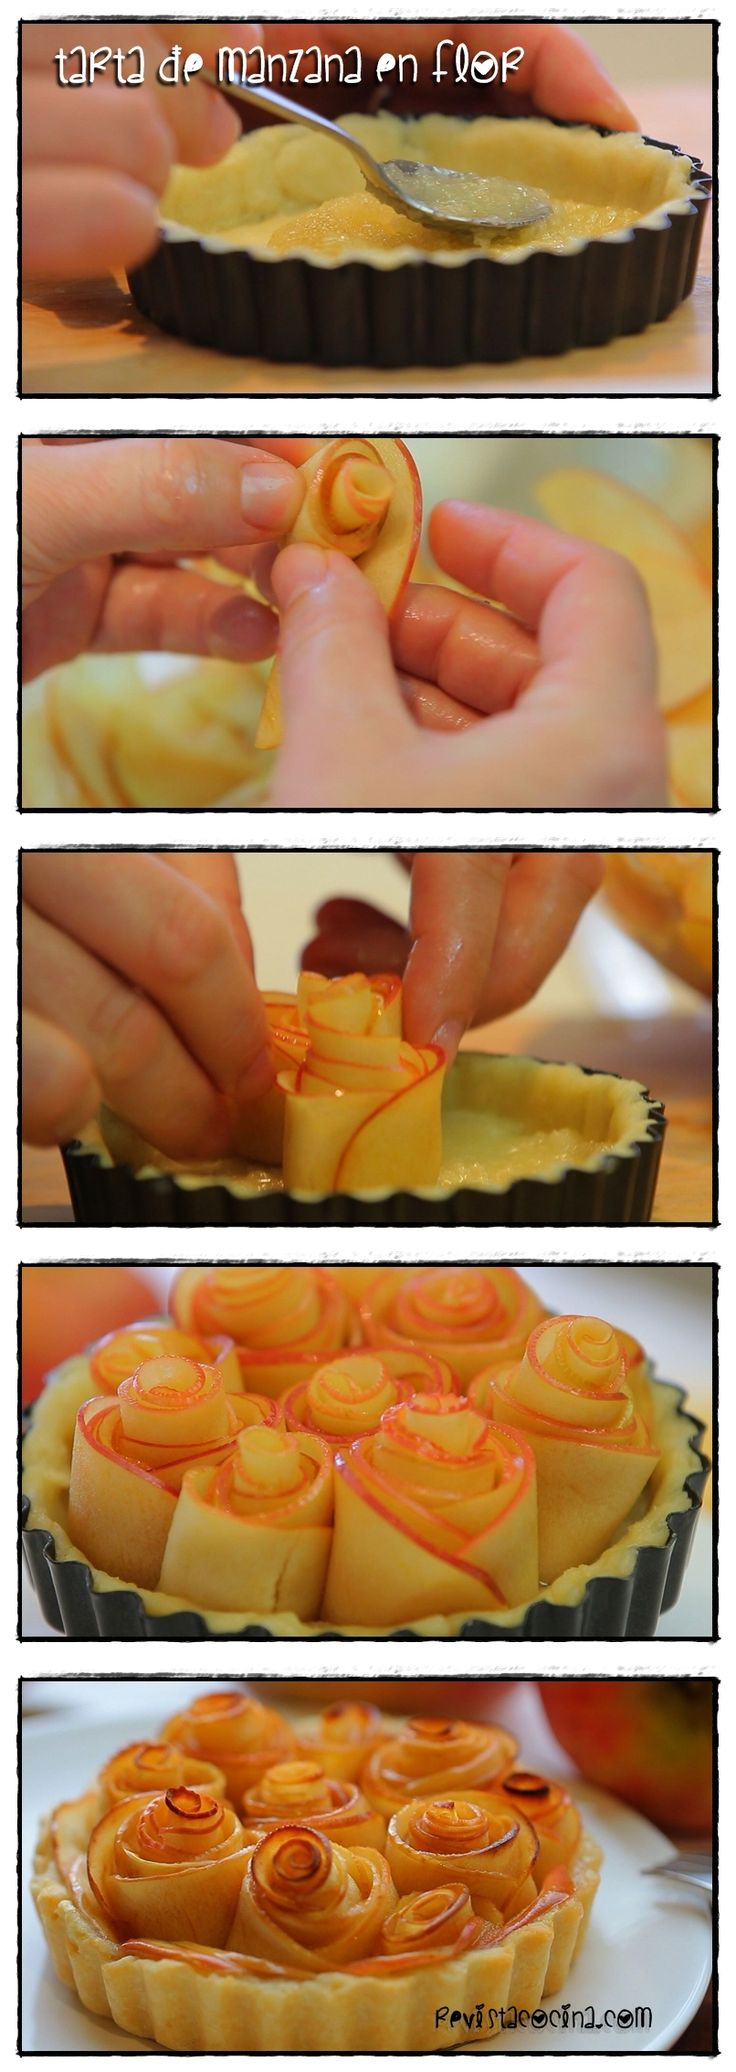 Receta de tarta de manzana en flor Receta: http://www.revistacocina.com/como-hacer-tarta-de-manzana-con-hojaldre/